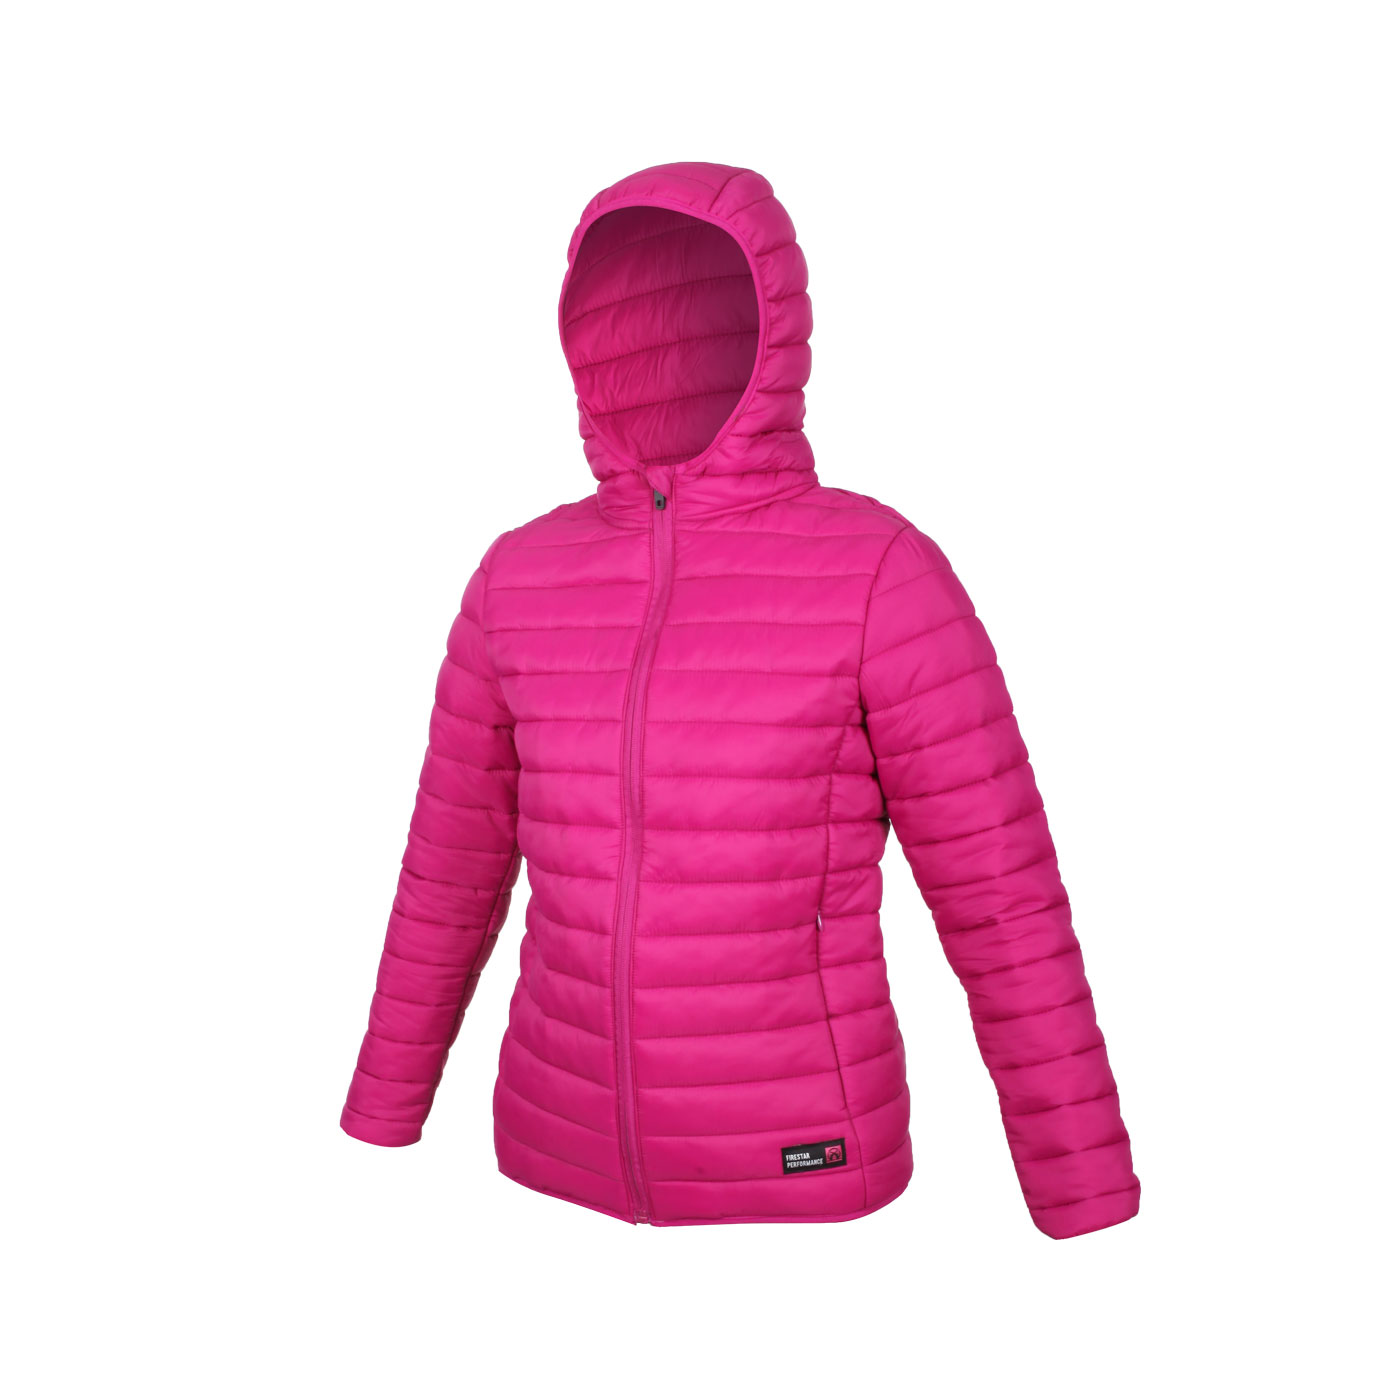 FIRESTAR 女款連帽鋪棉外套 HL038-47 - 紫桃紅